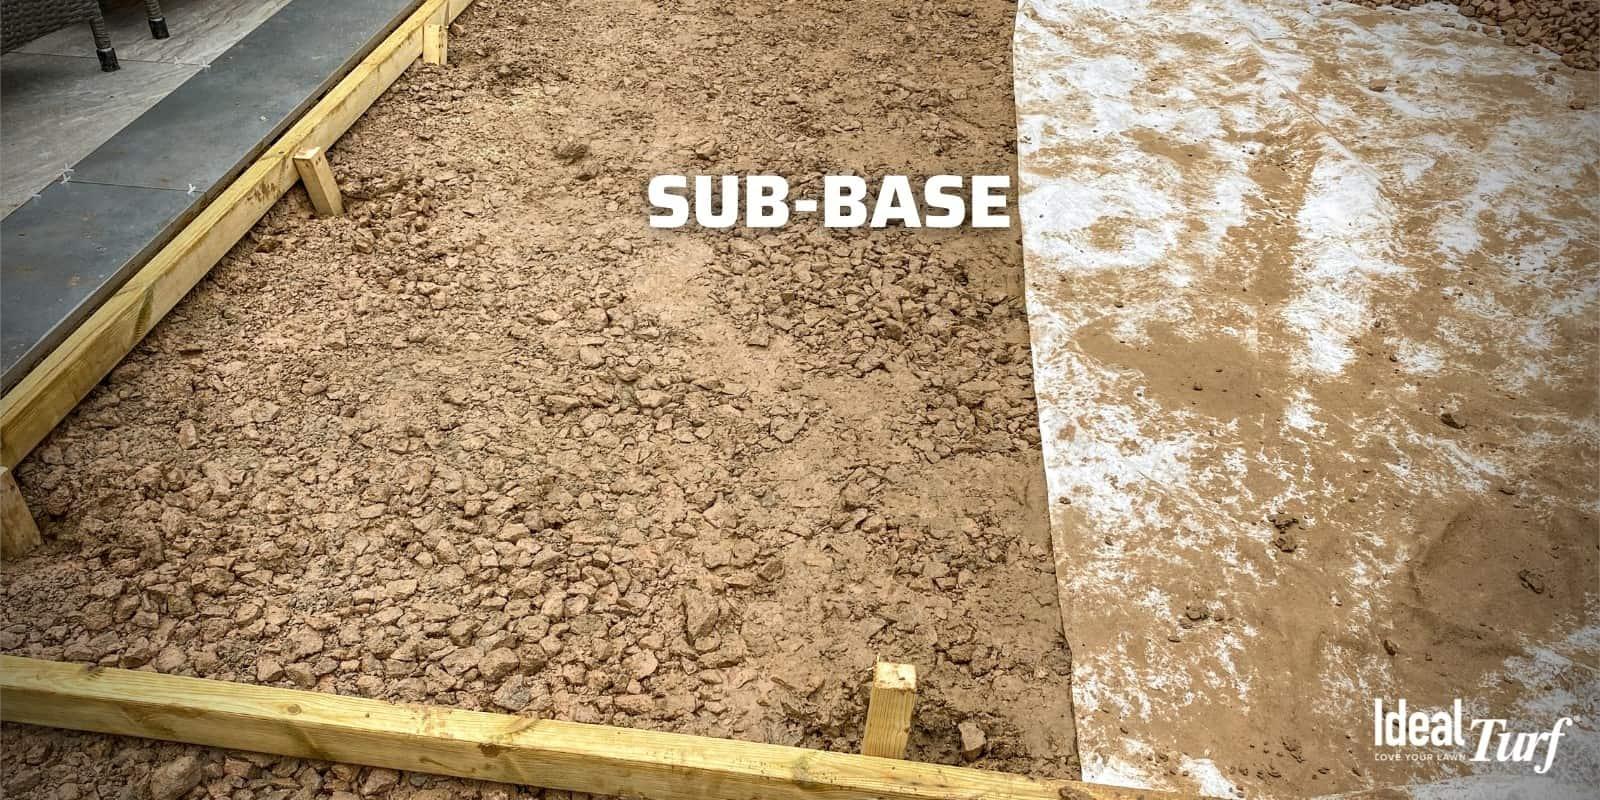 Turf installation sub-base